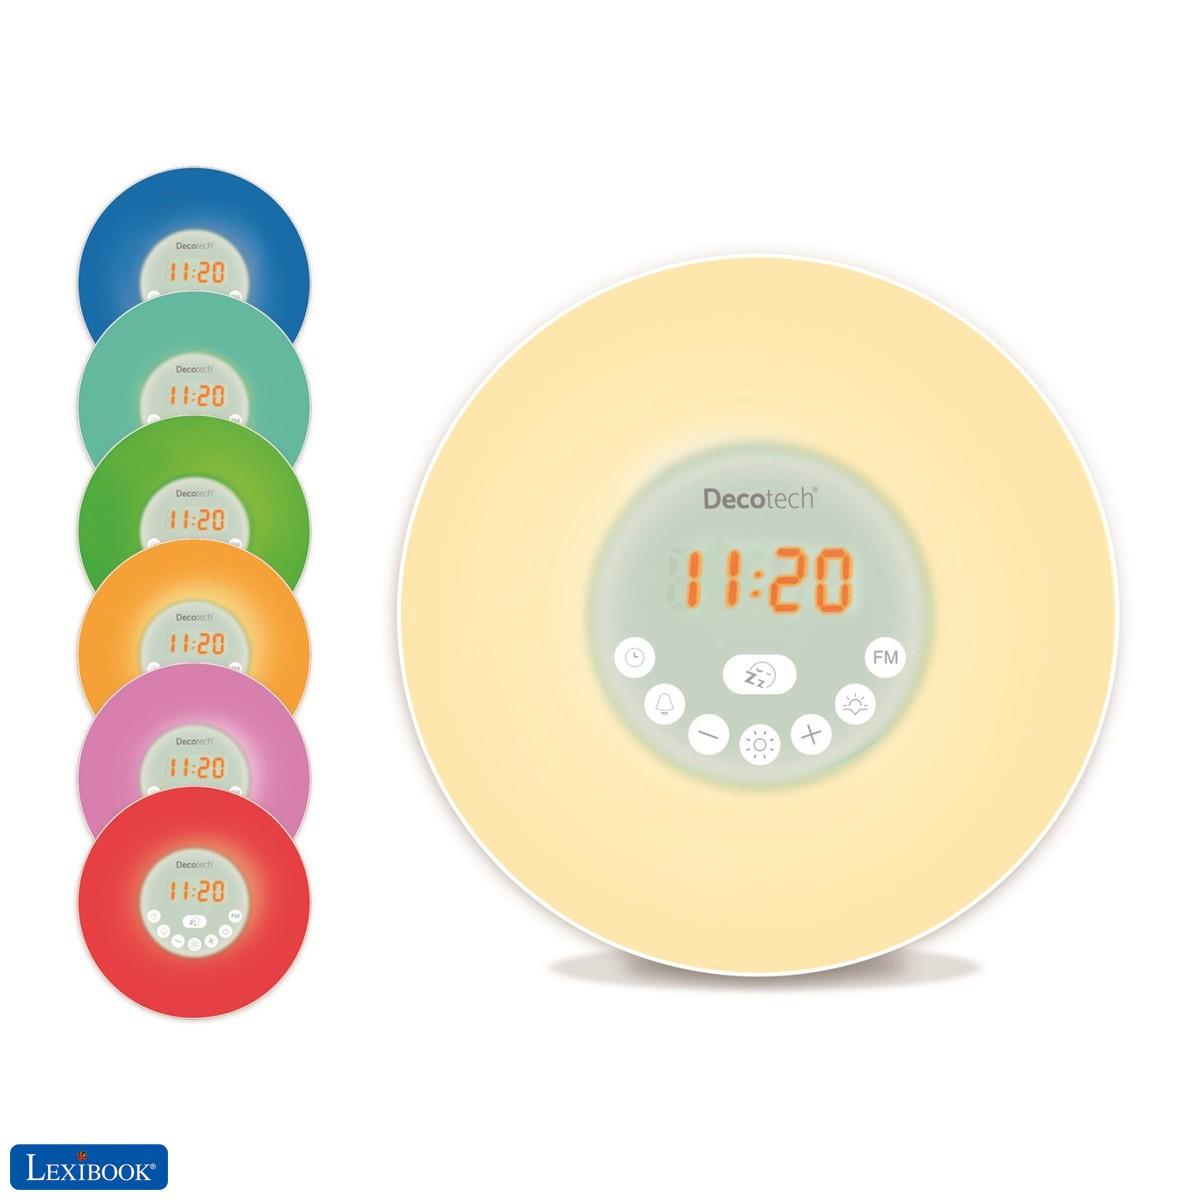 Decotech - Sunrise colour alarm clock